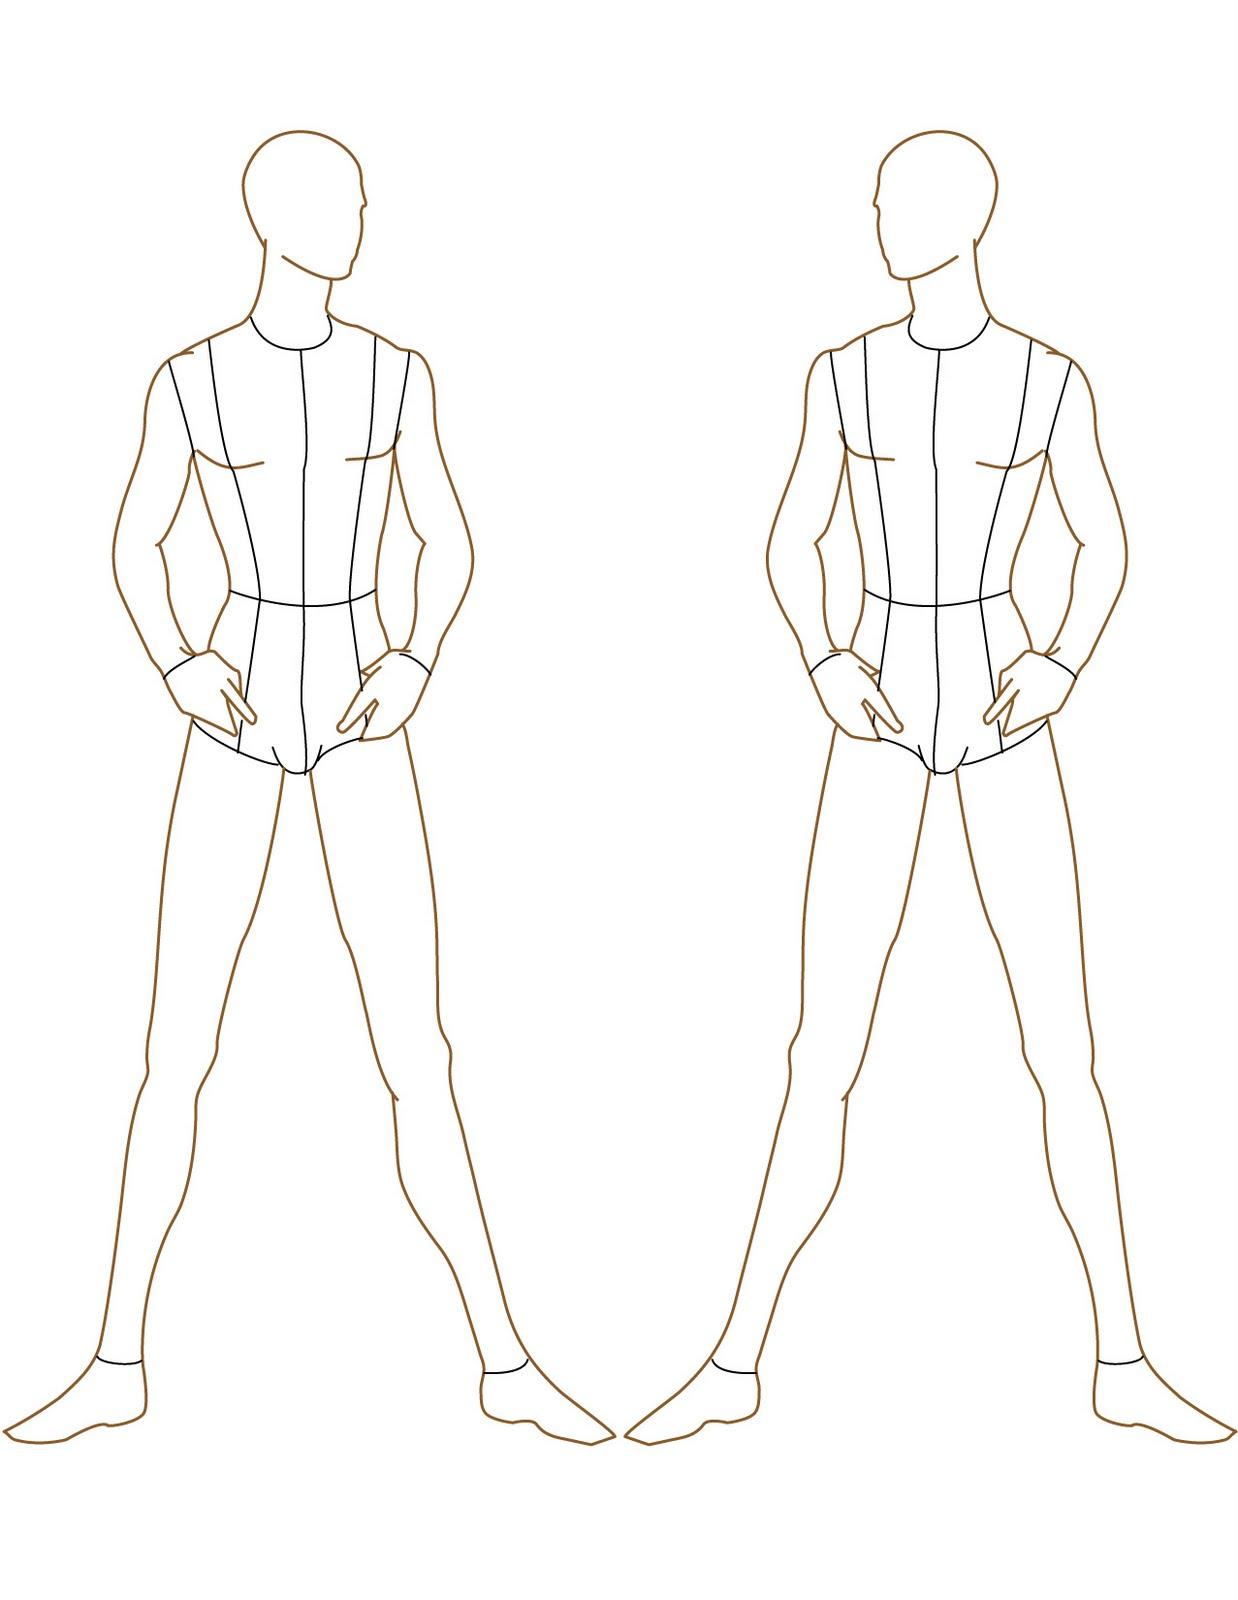 Blank fashion design templates 14